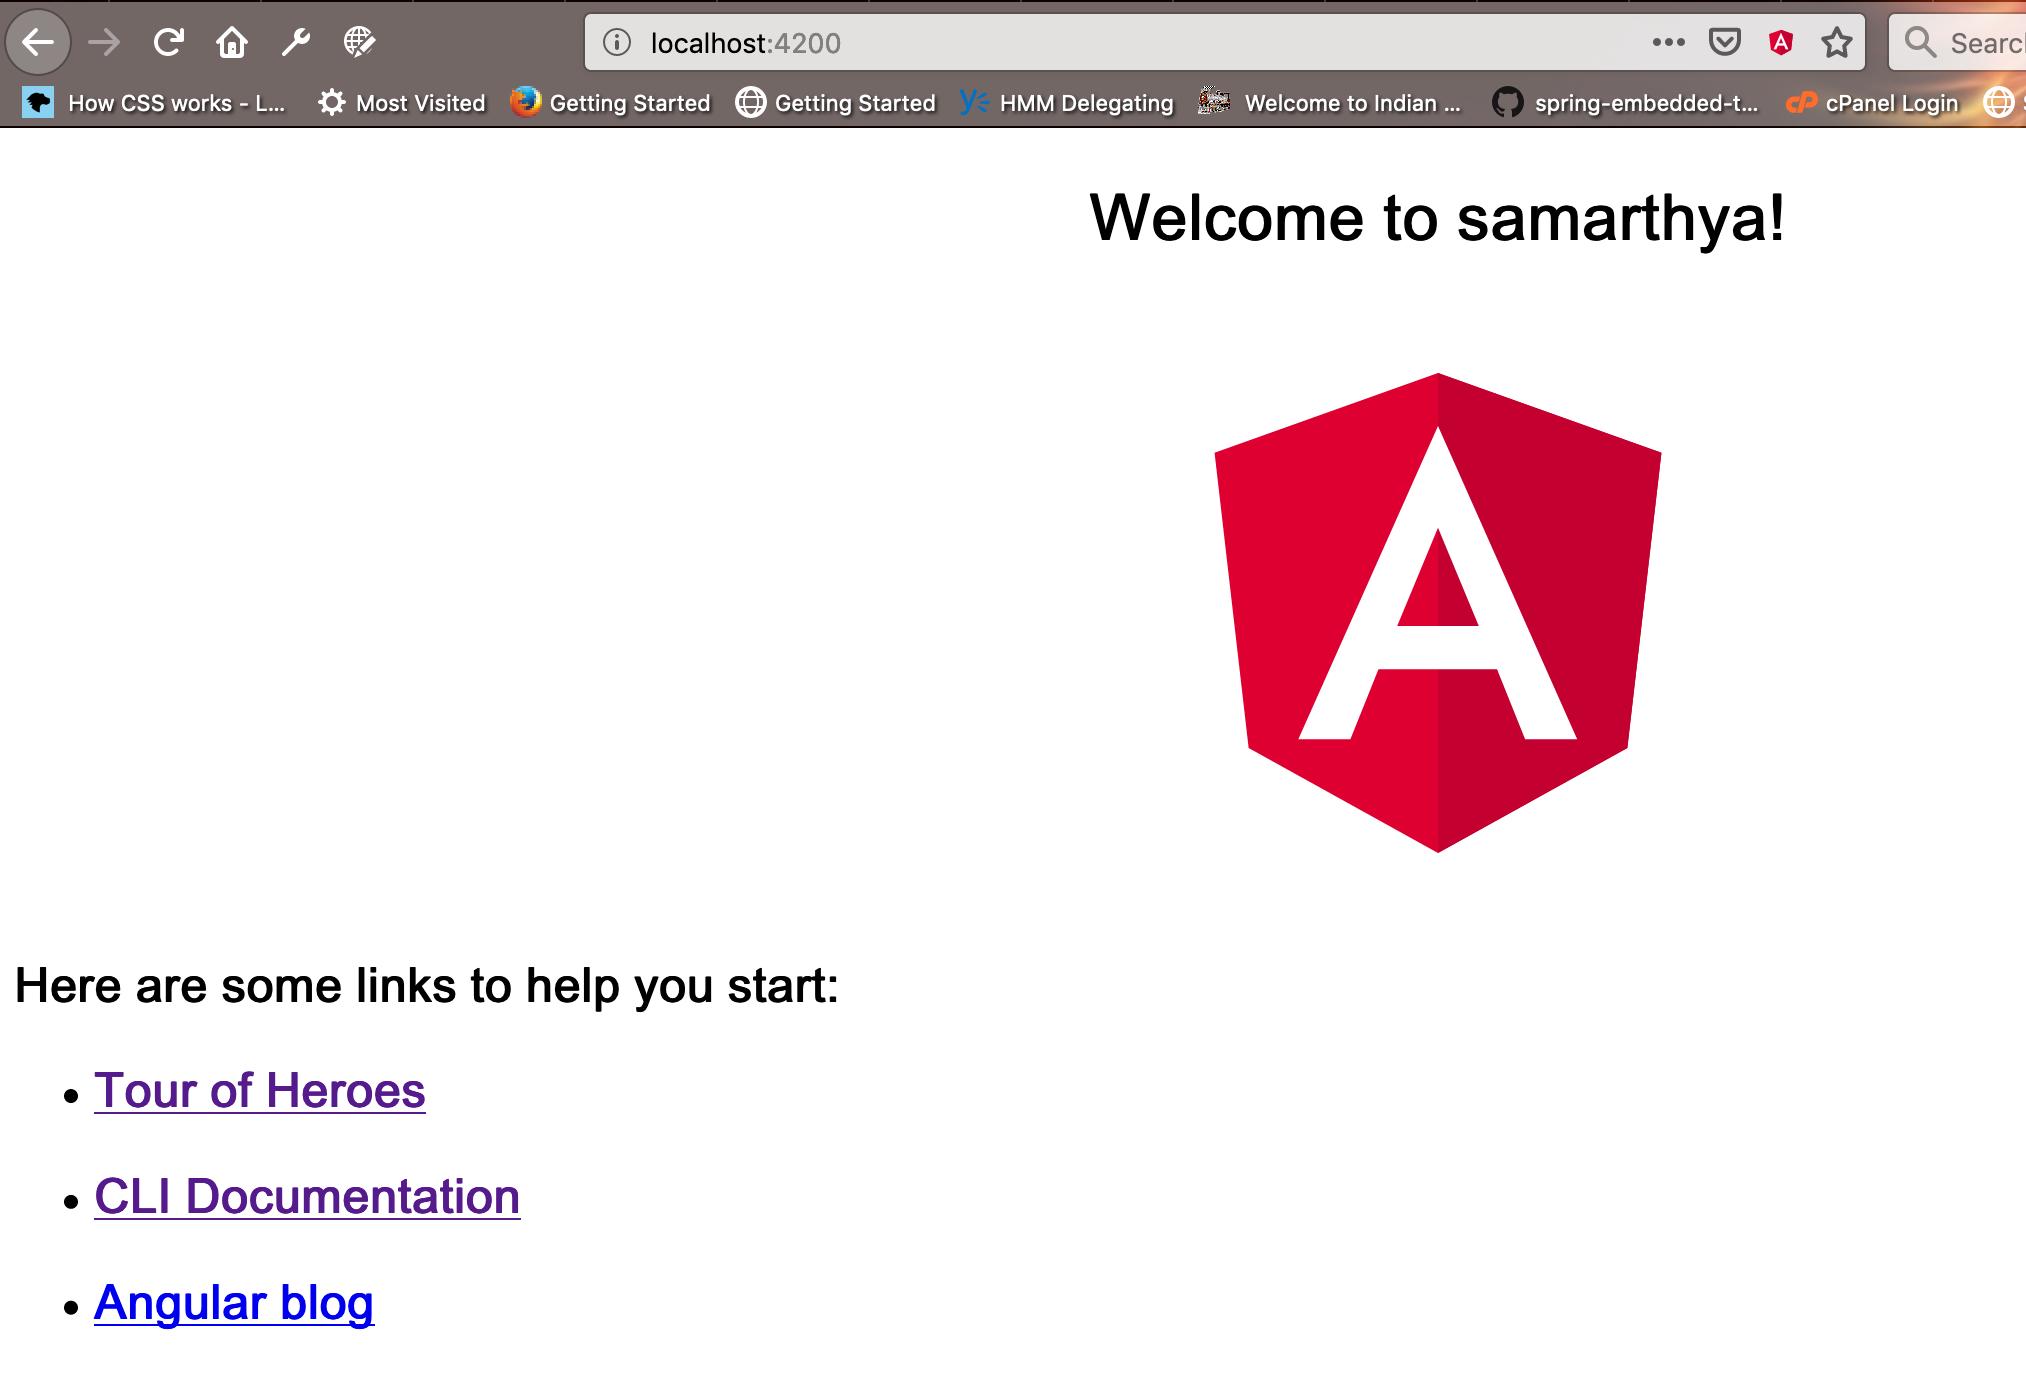 Startup application